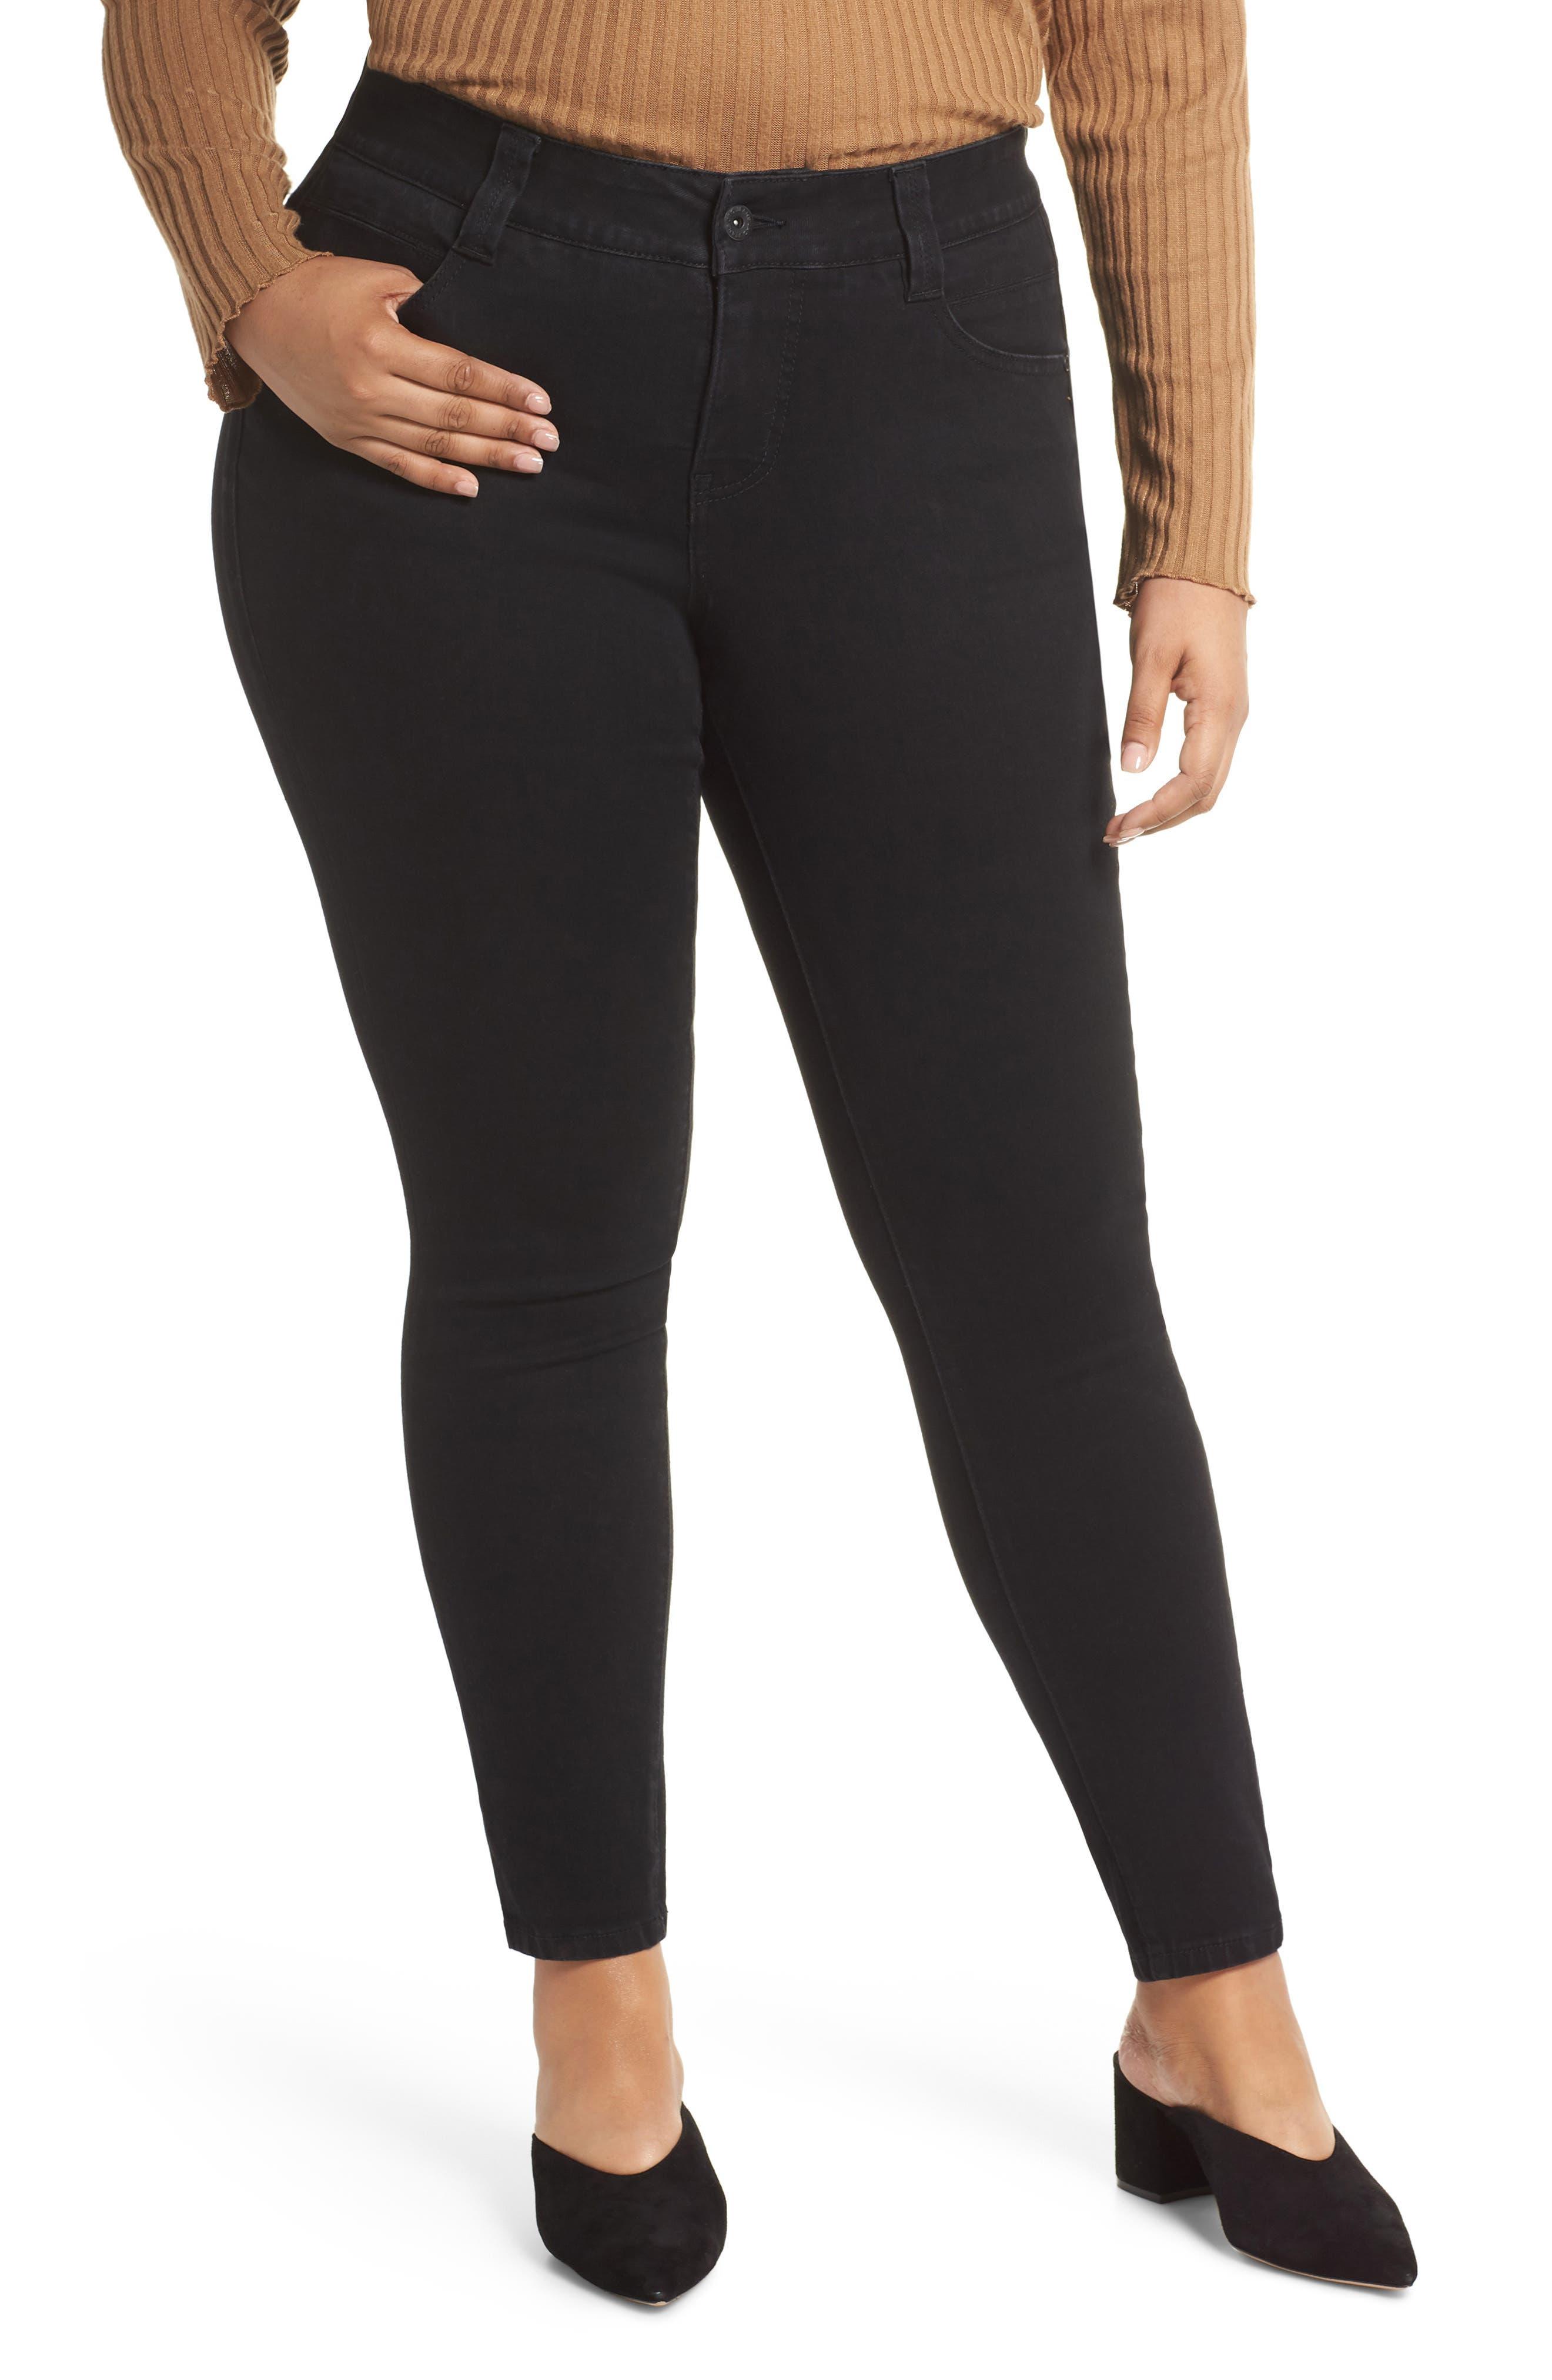 Cecilia Stretch Skinny Jeans in Black